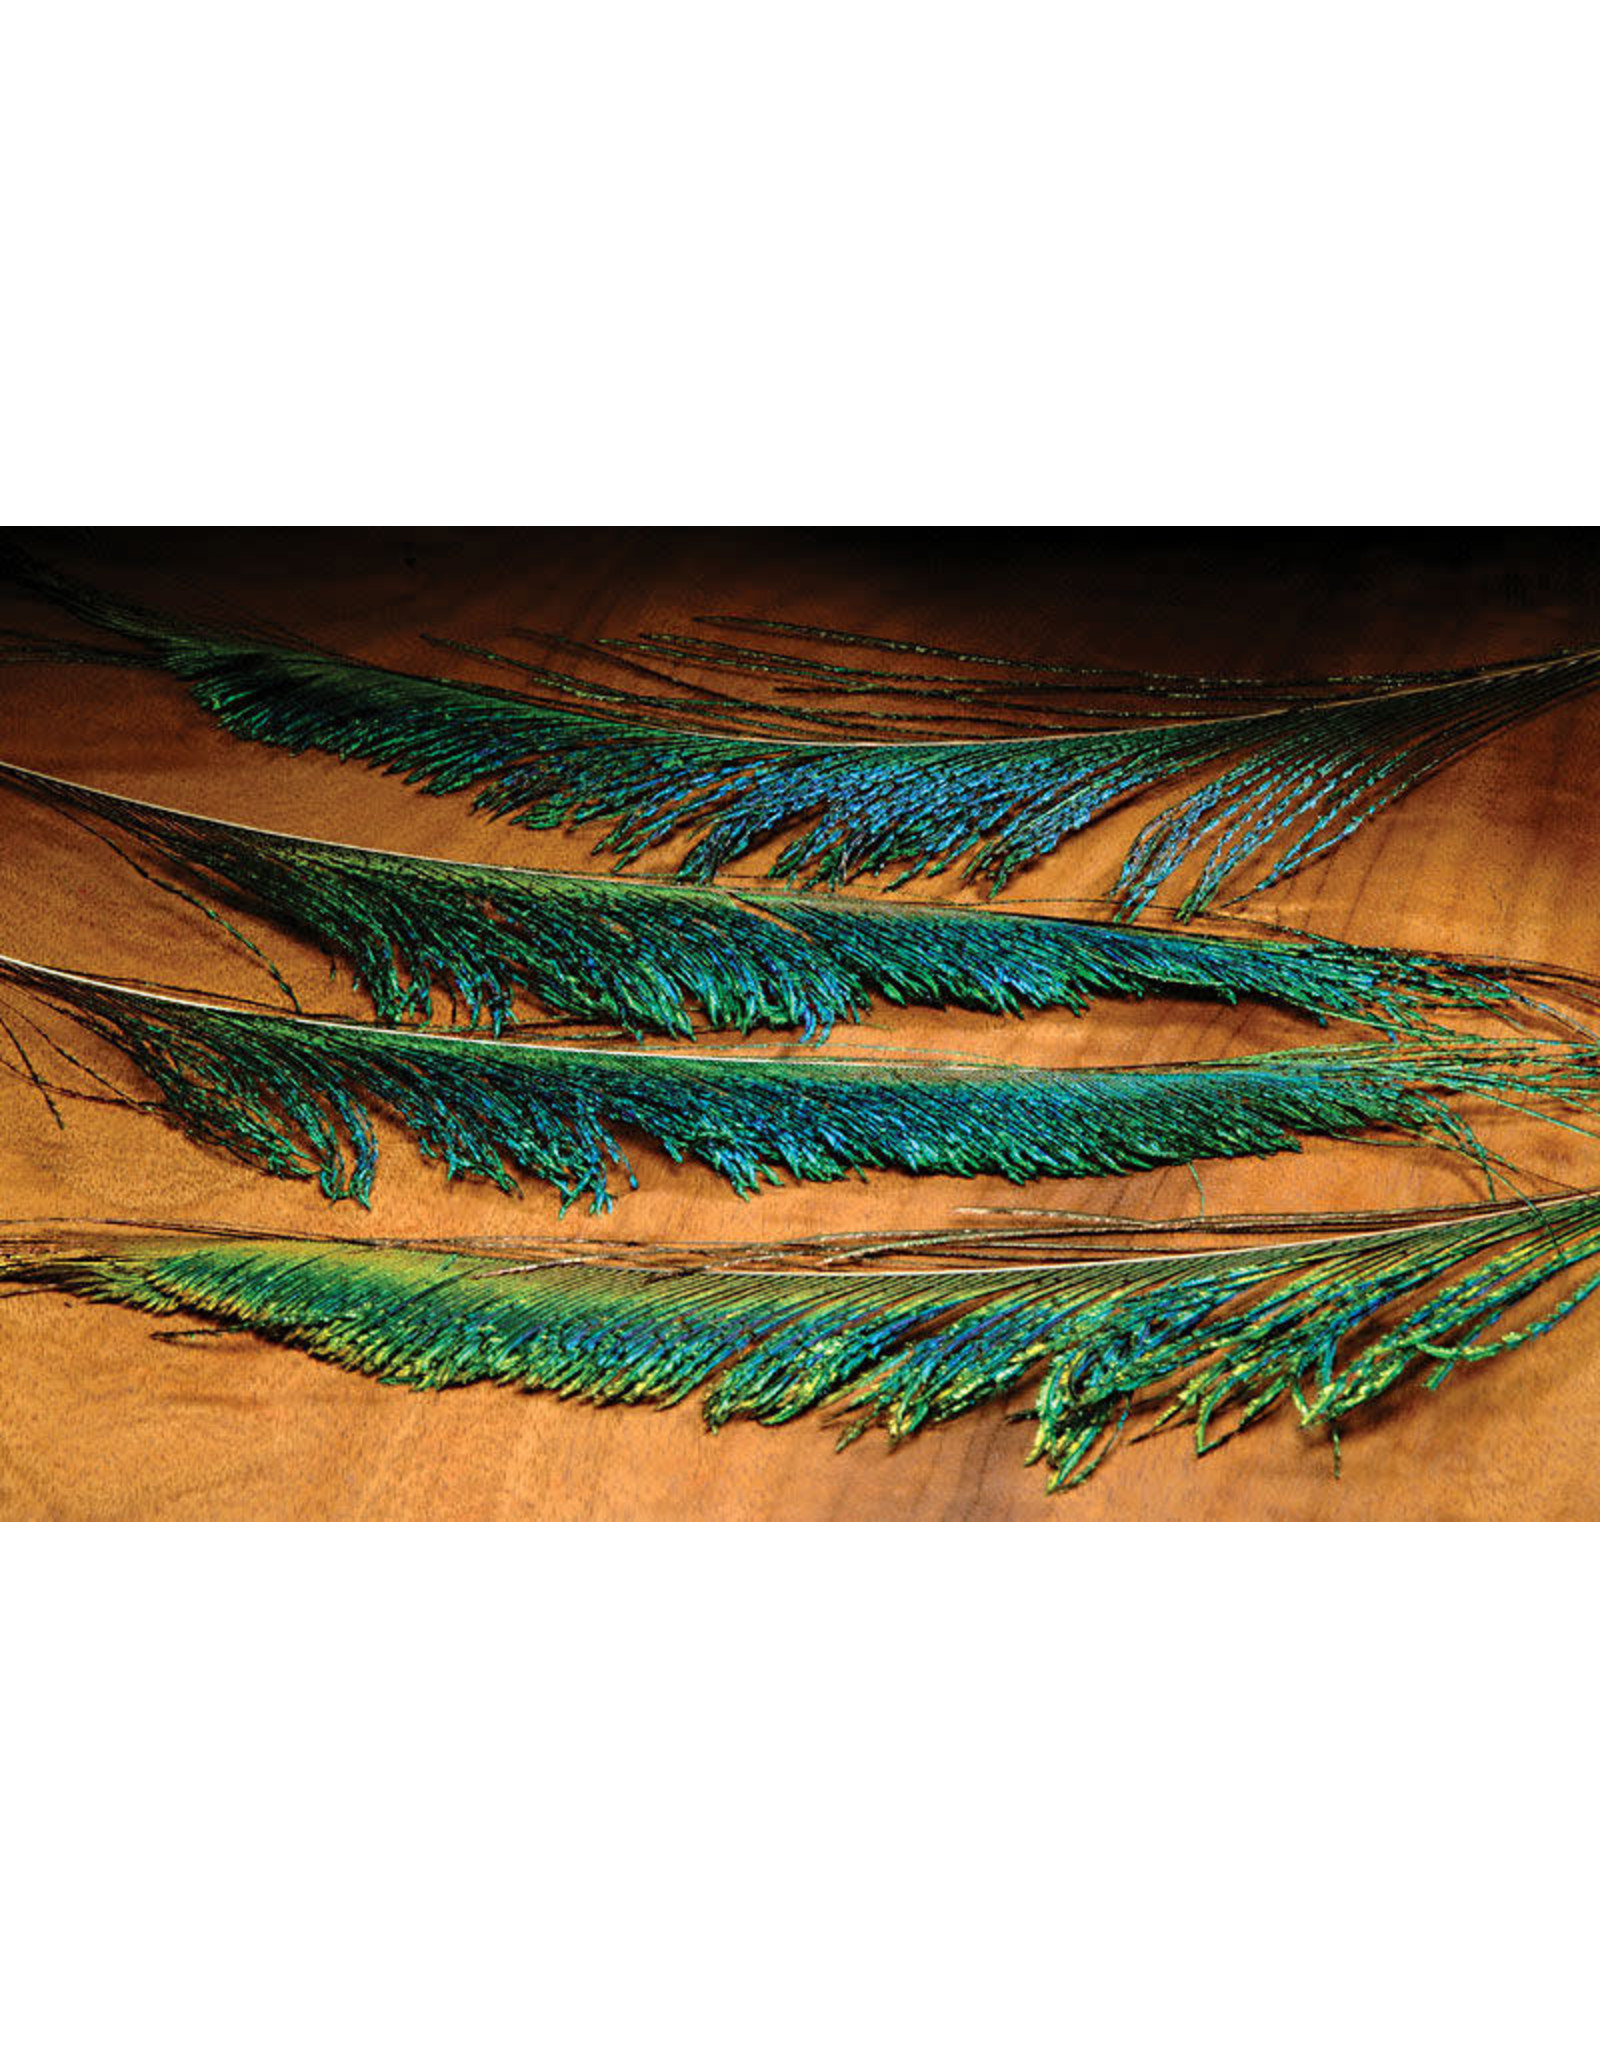 Hareline Hareline Peacock Sword